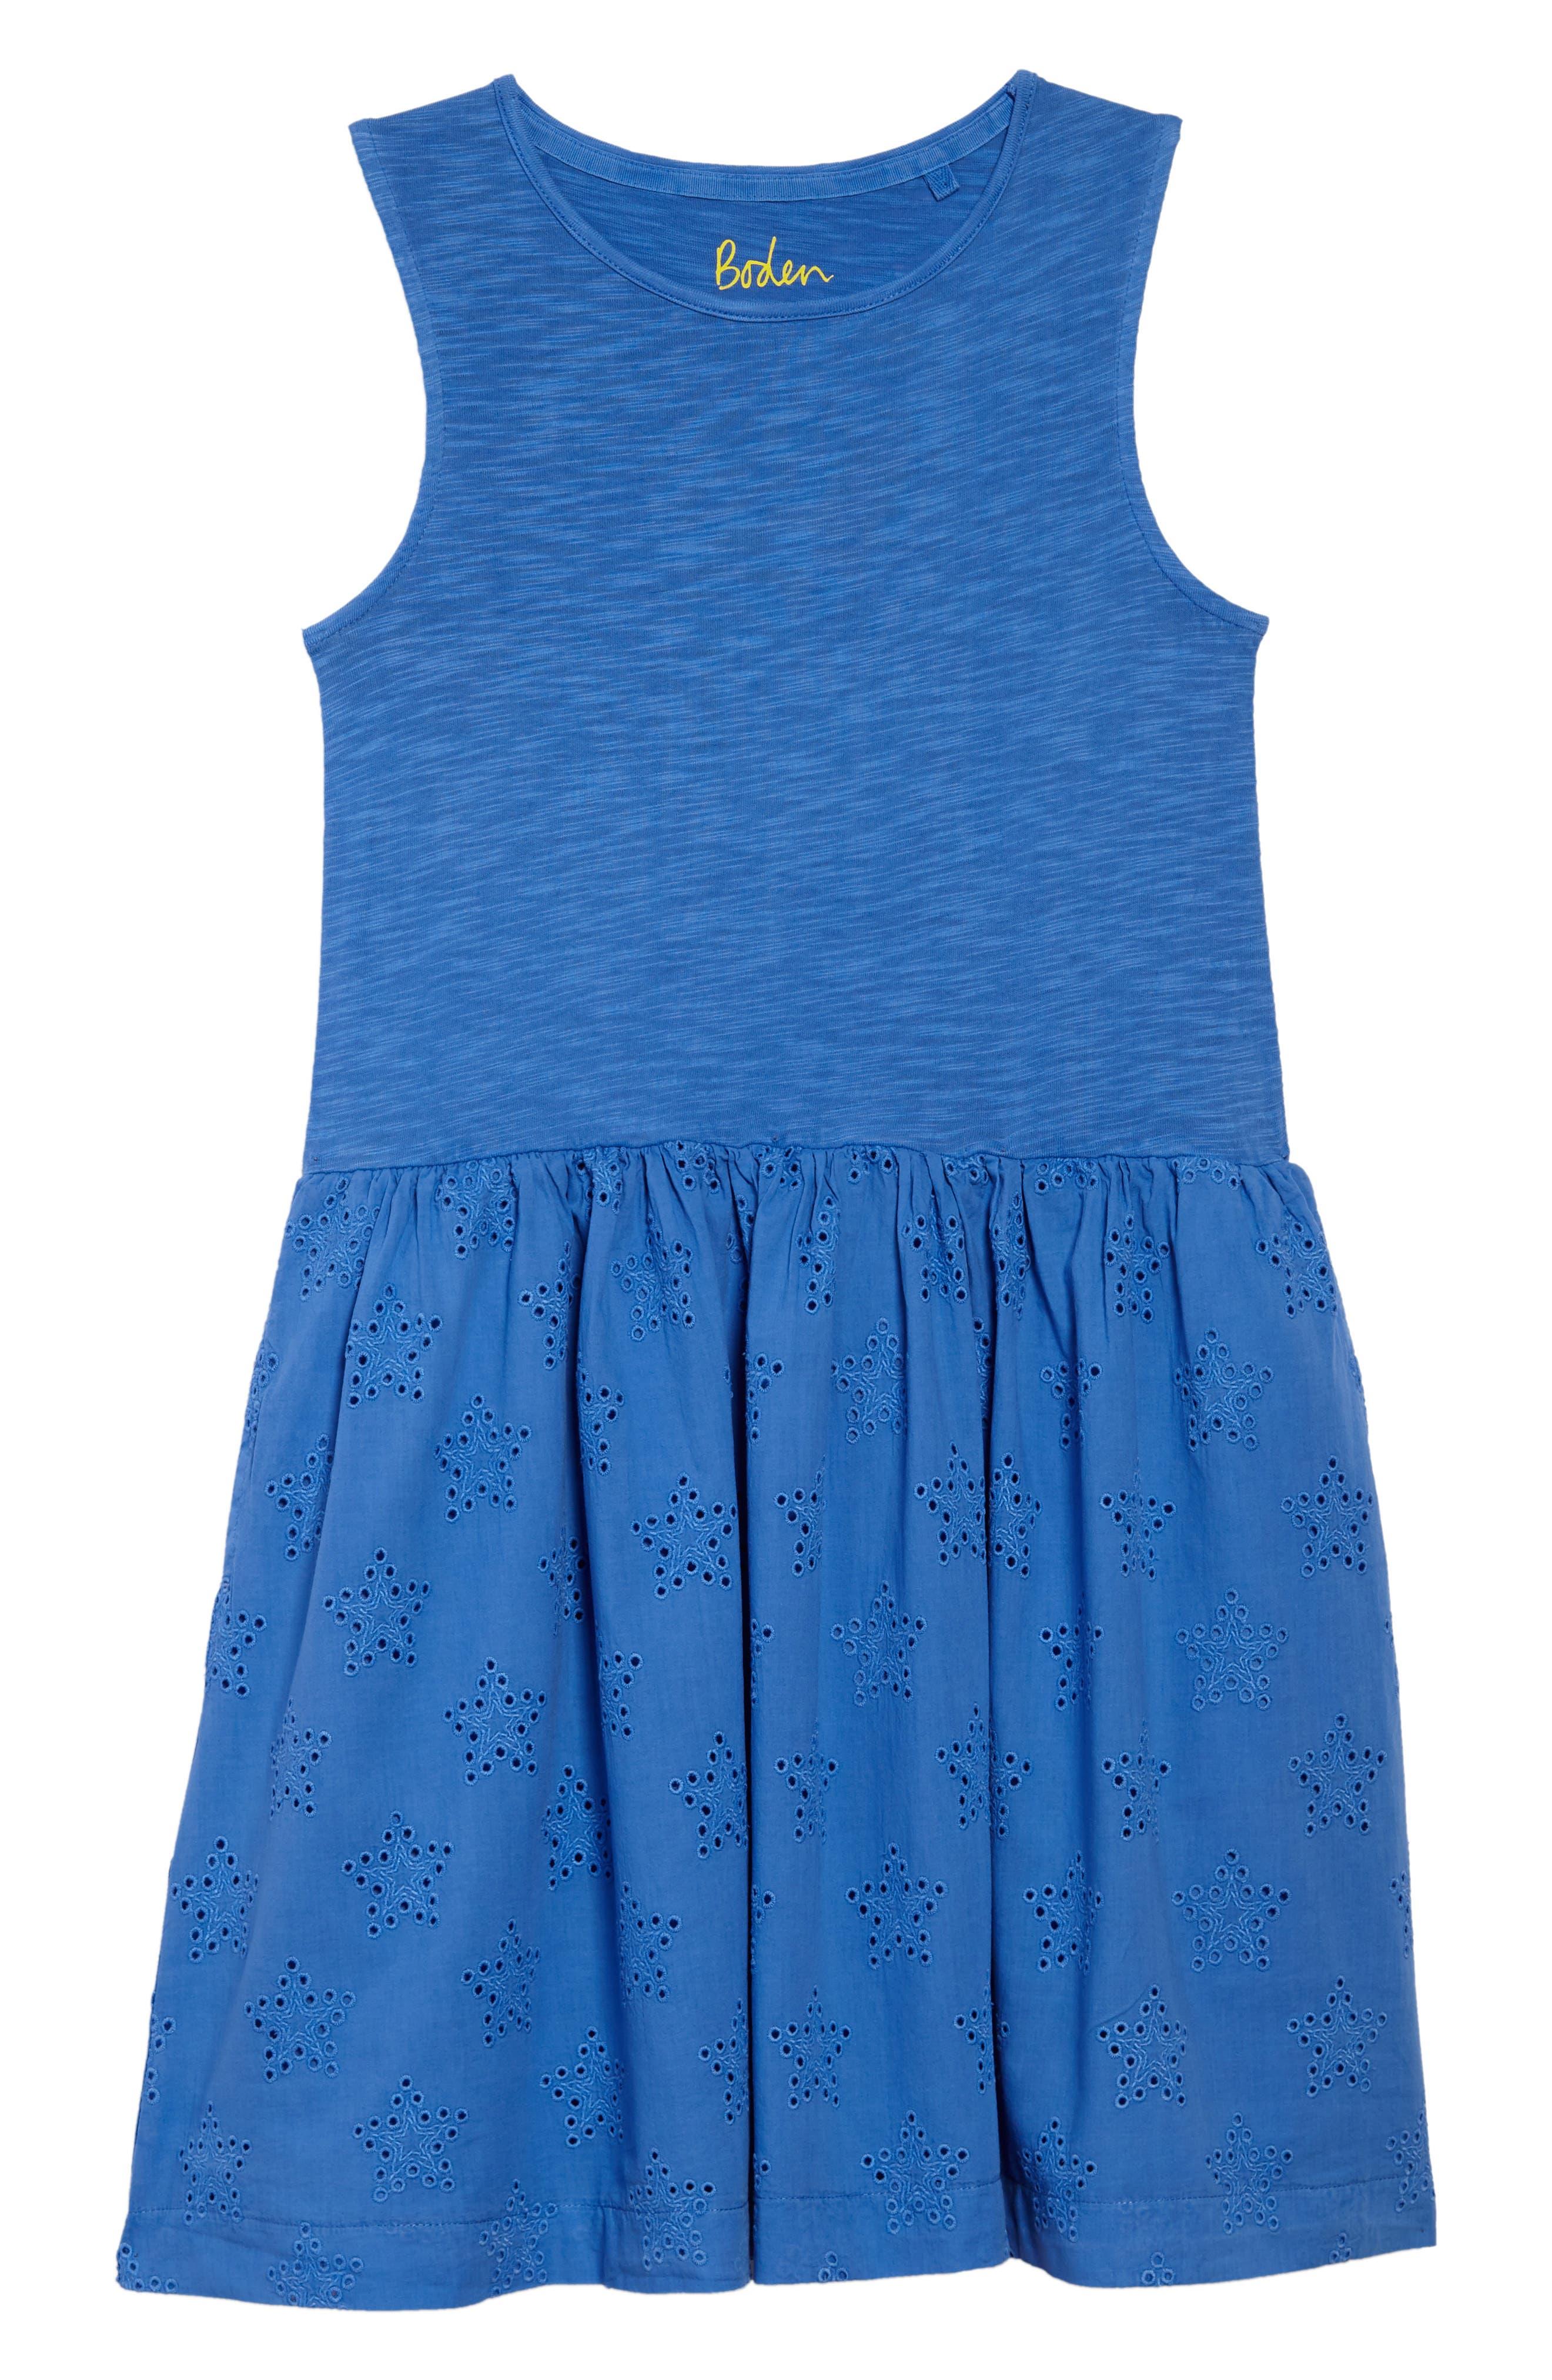 MINI BODEN Eyelet Dress, Main, color, 424